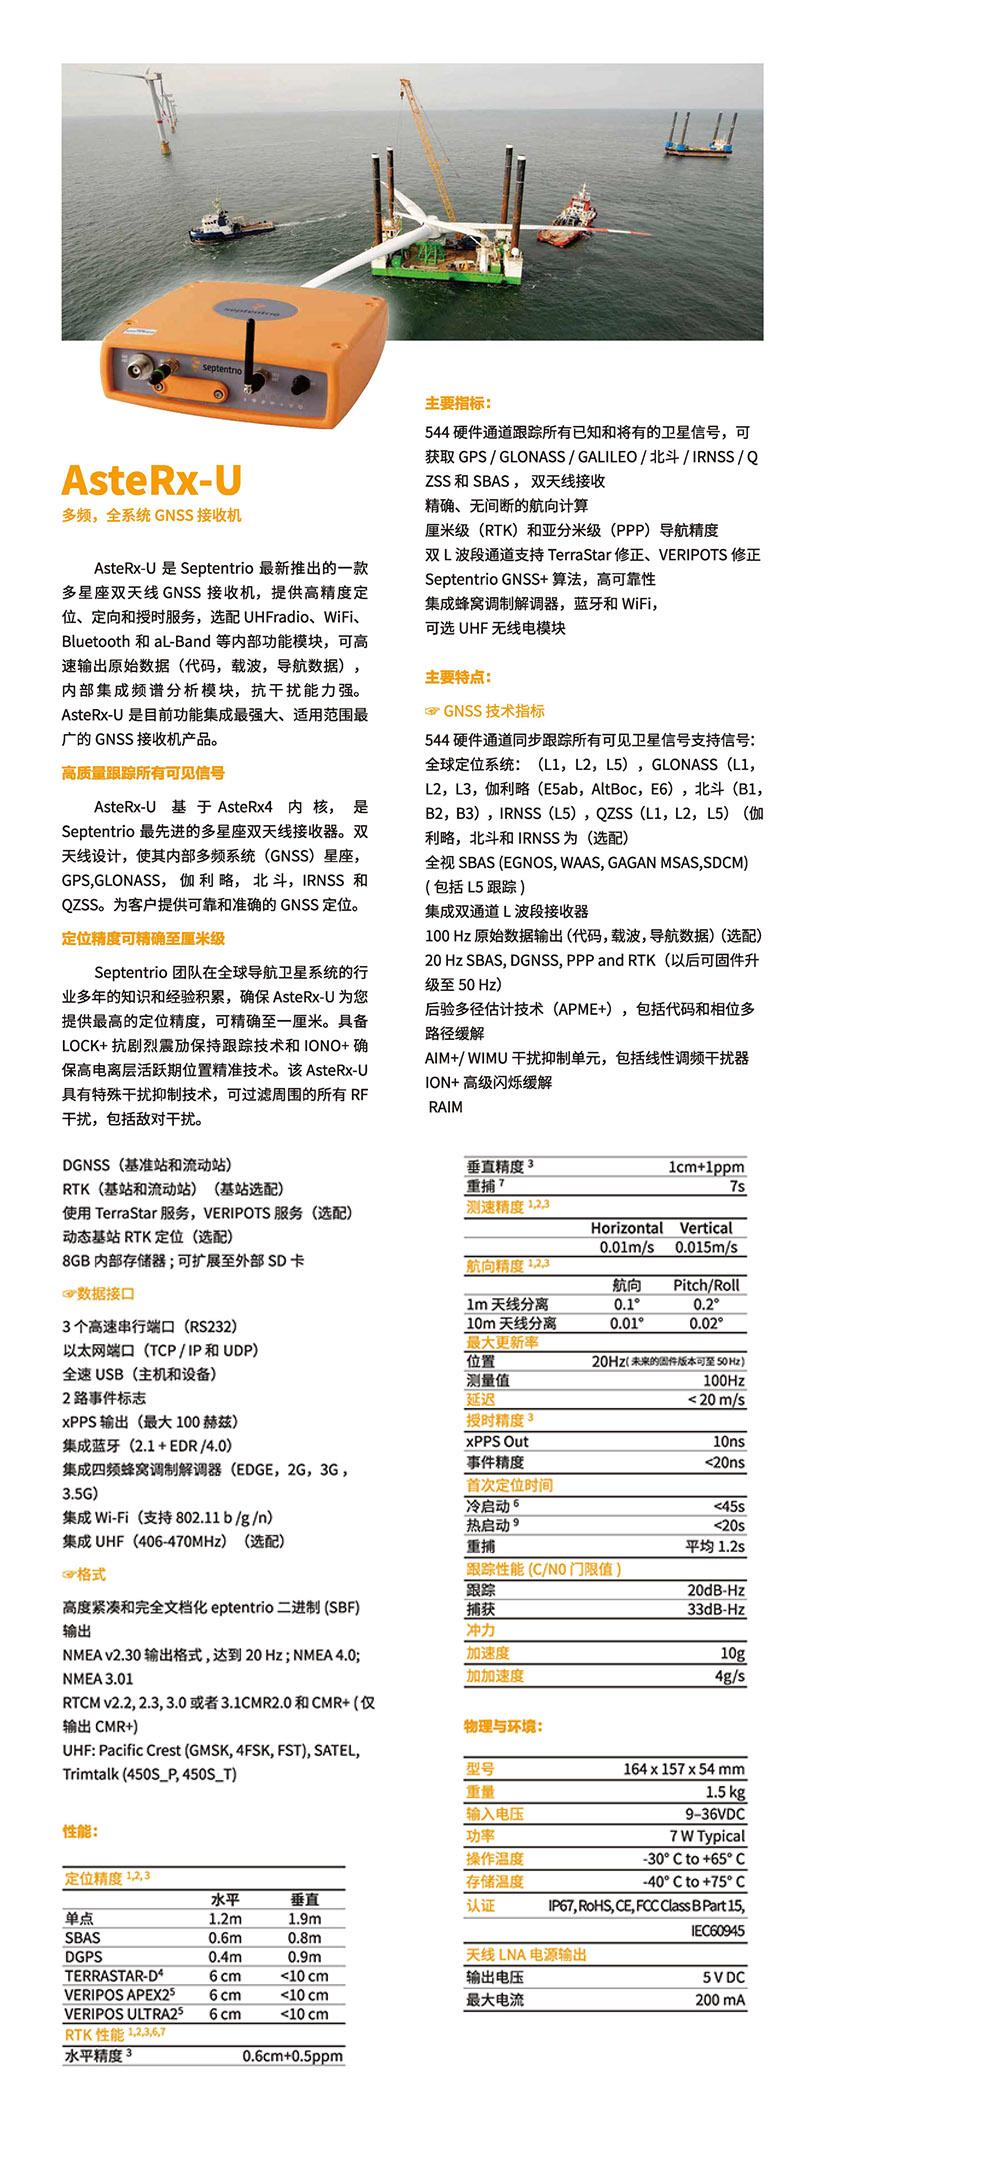 AsteRx-U 多频全系统GNSS接收机-详情.jpg